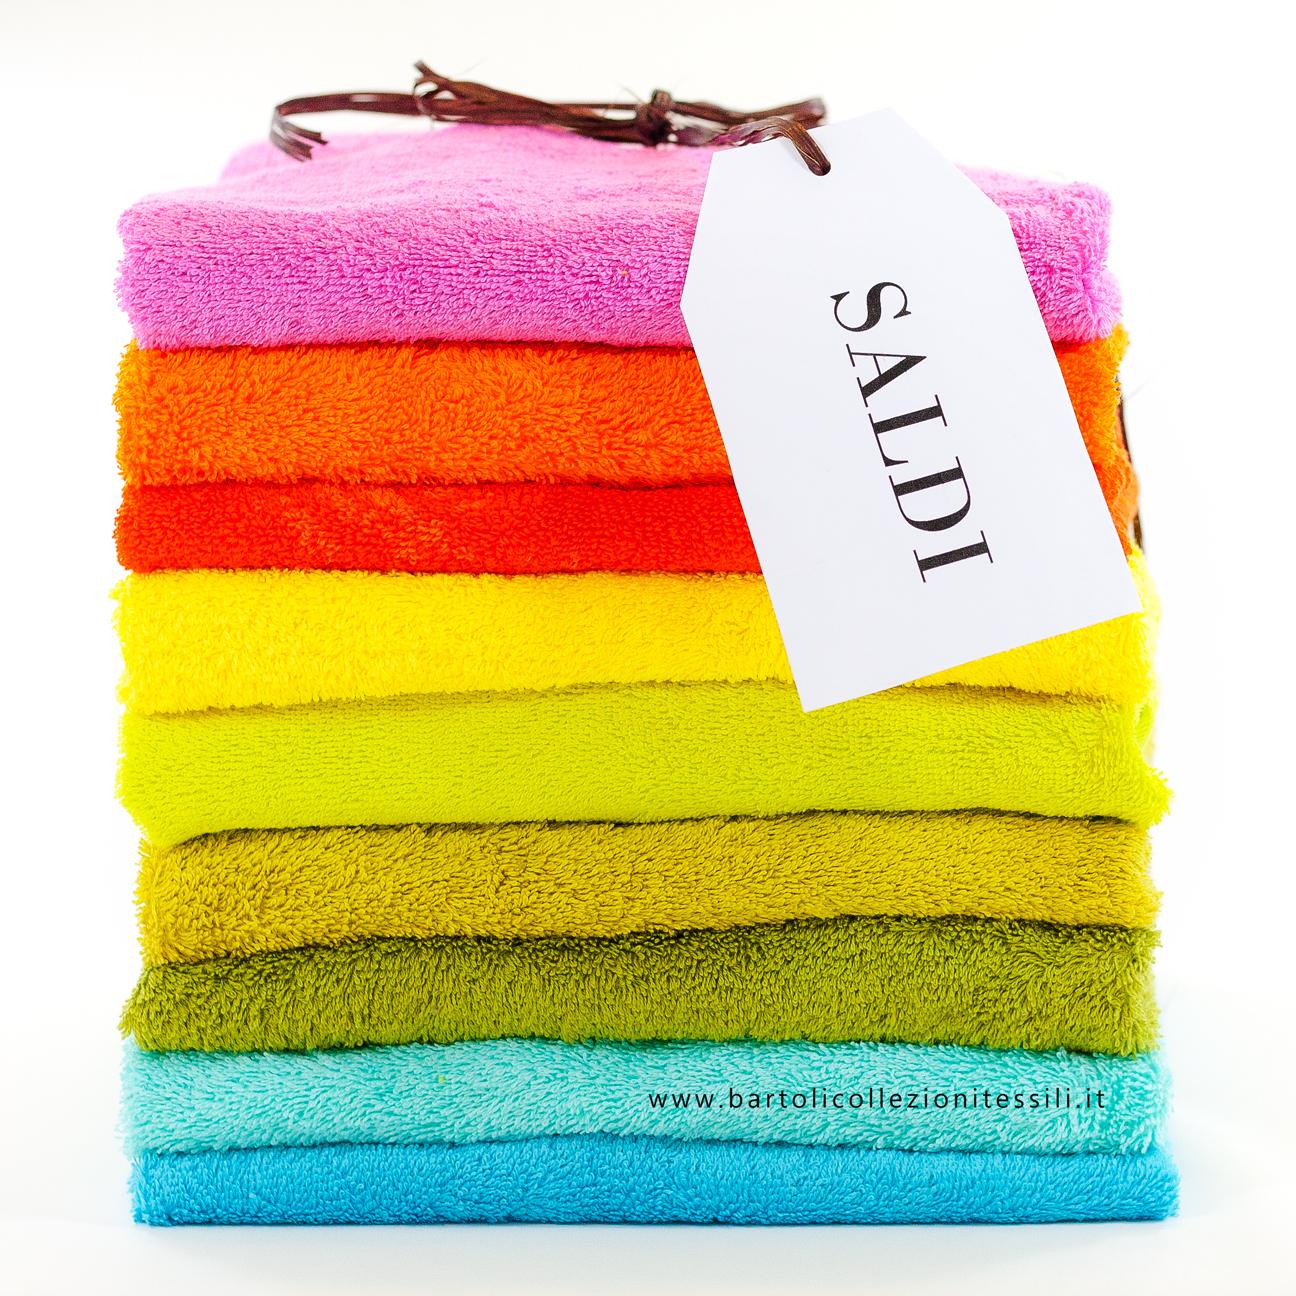 Saldi Biancheria per la casa e tappeti - asciugamani colorati